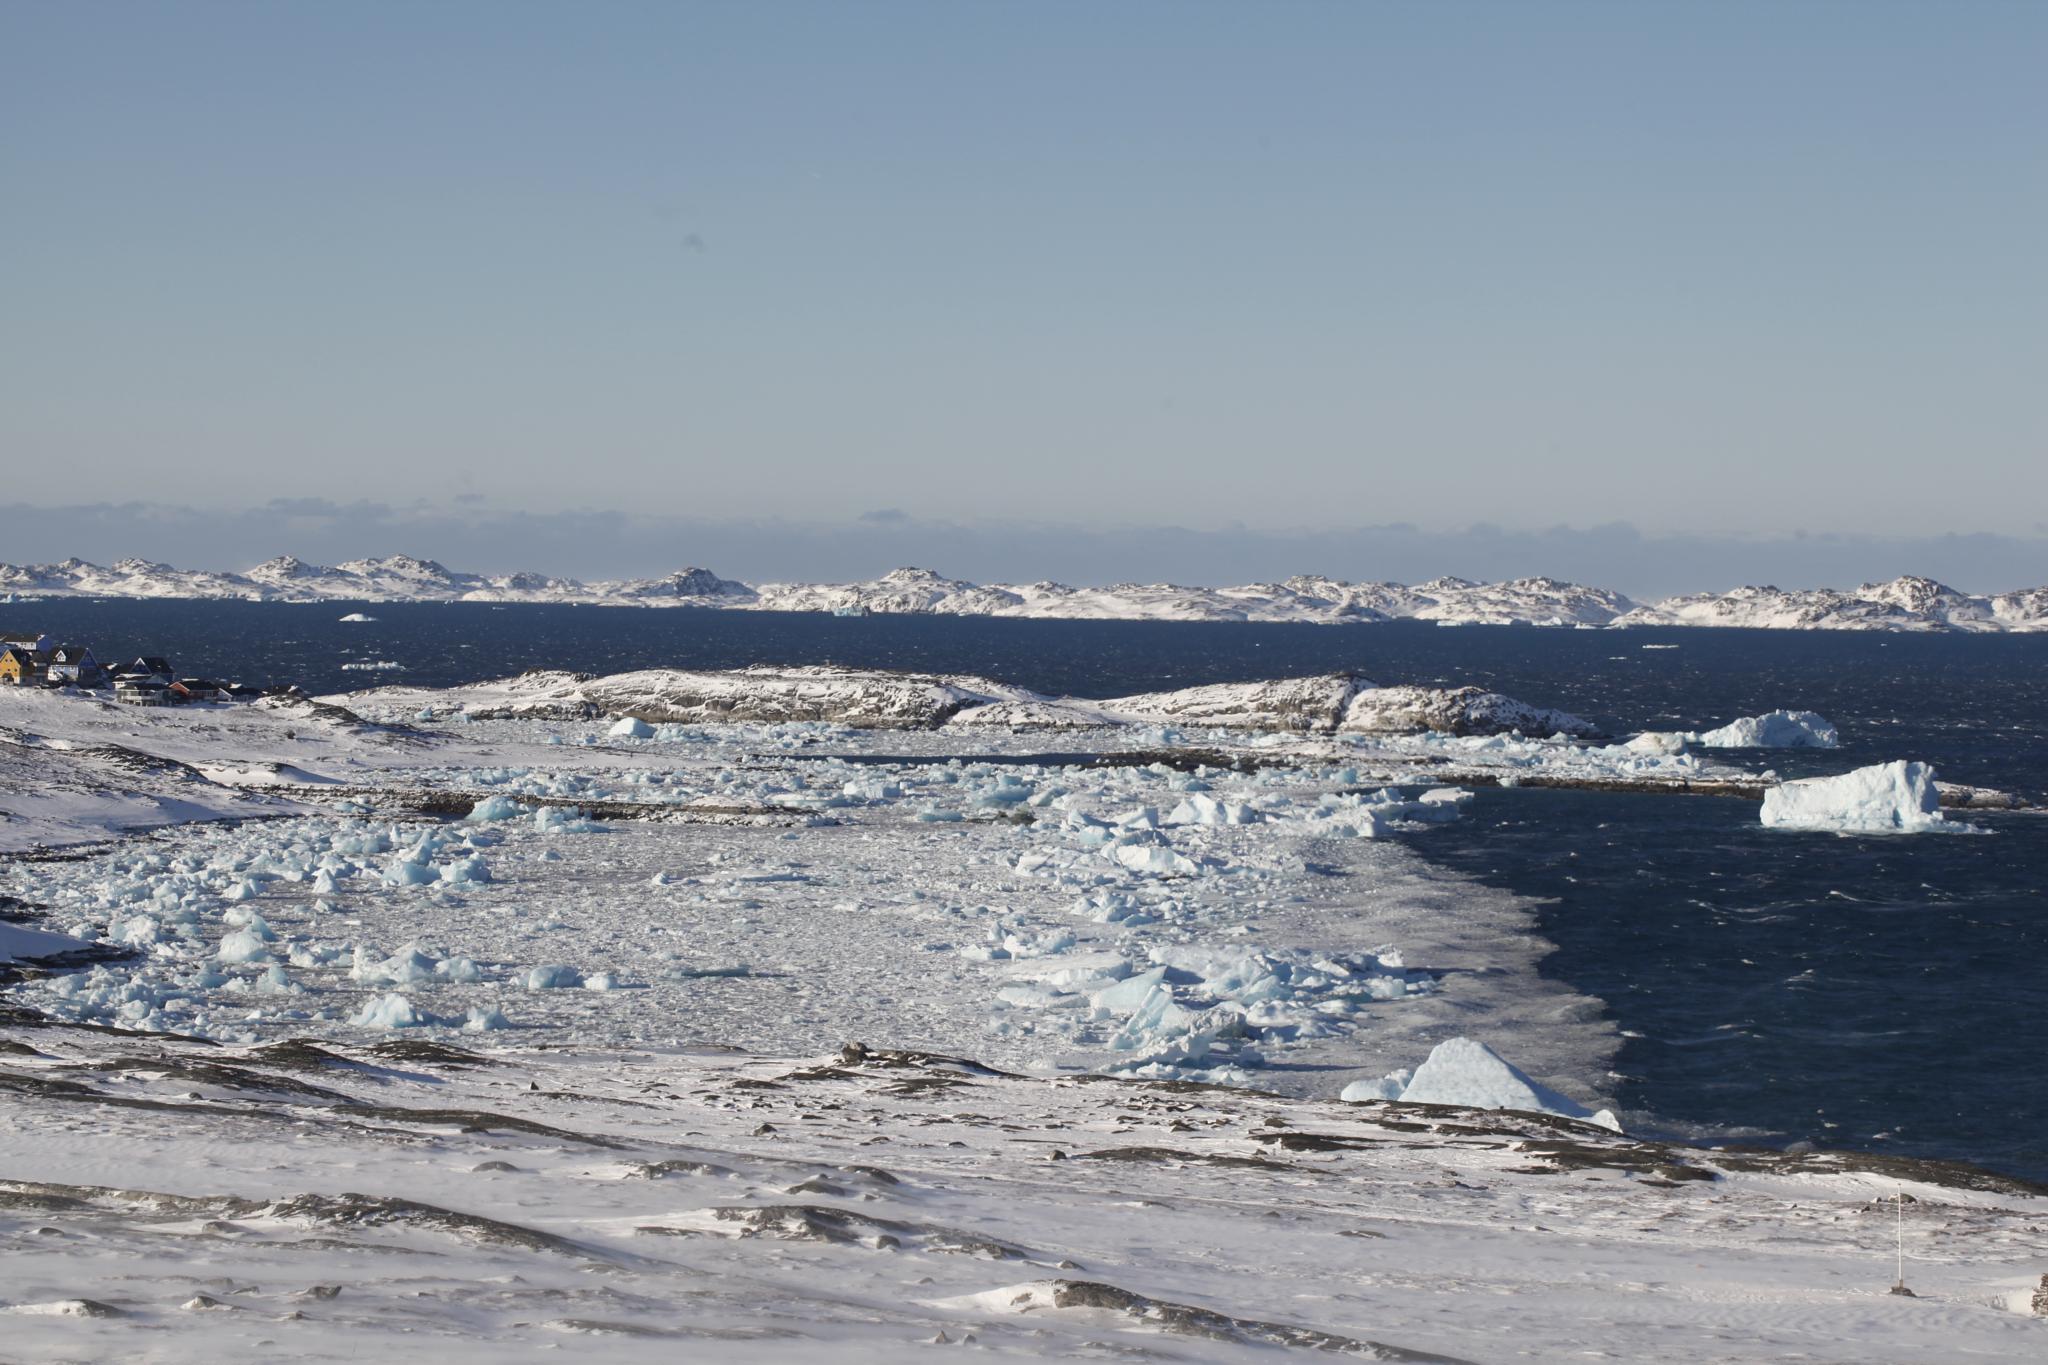 winter in Nuuk greenland by Tom Augo Lynge